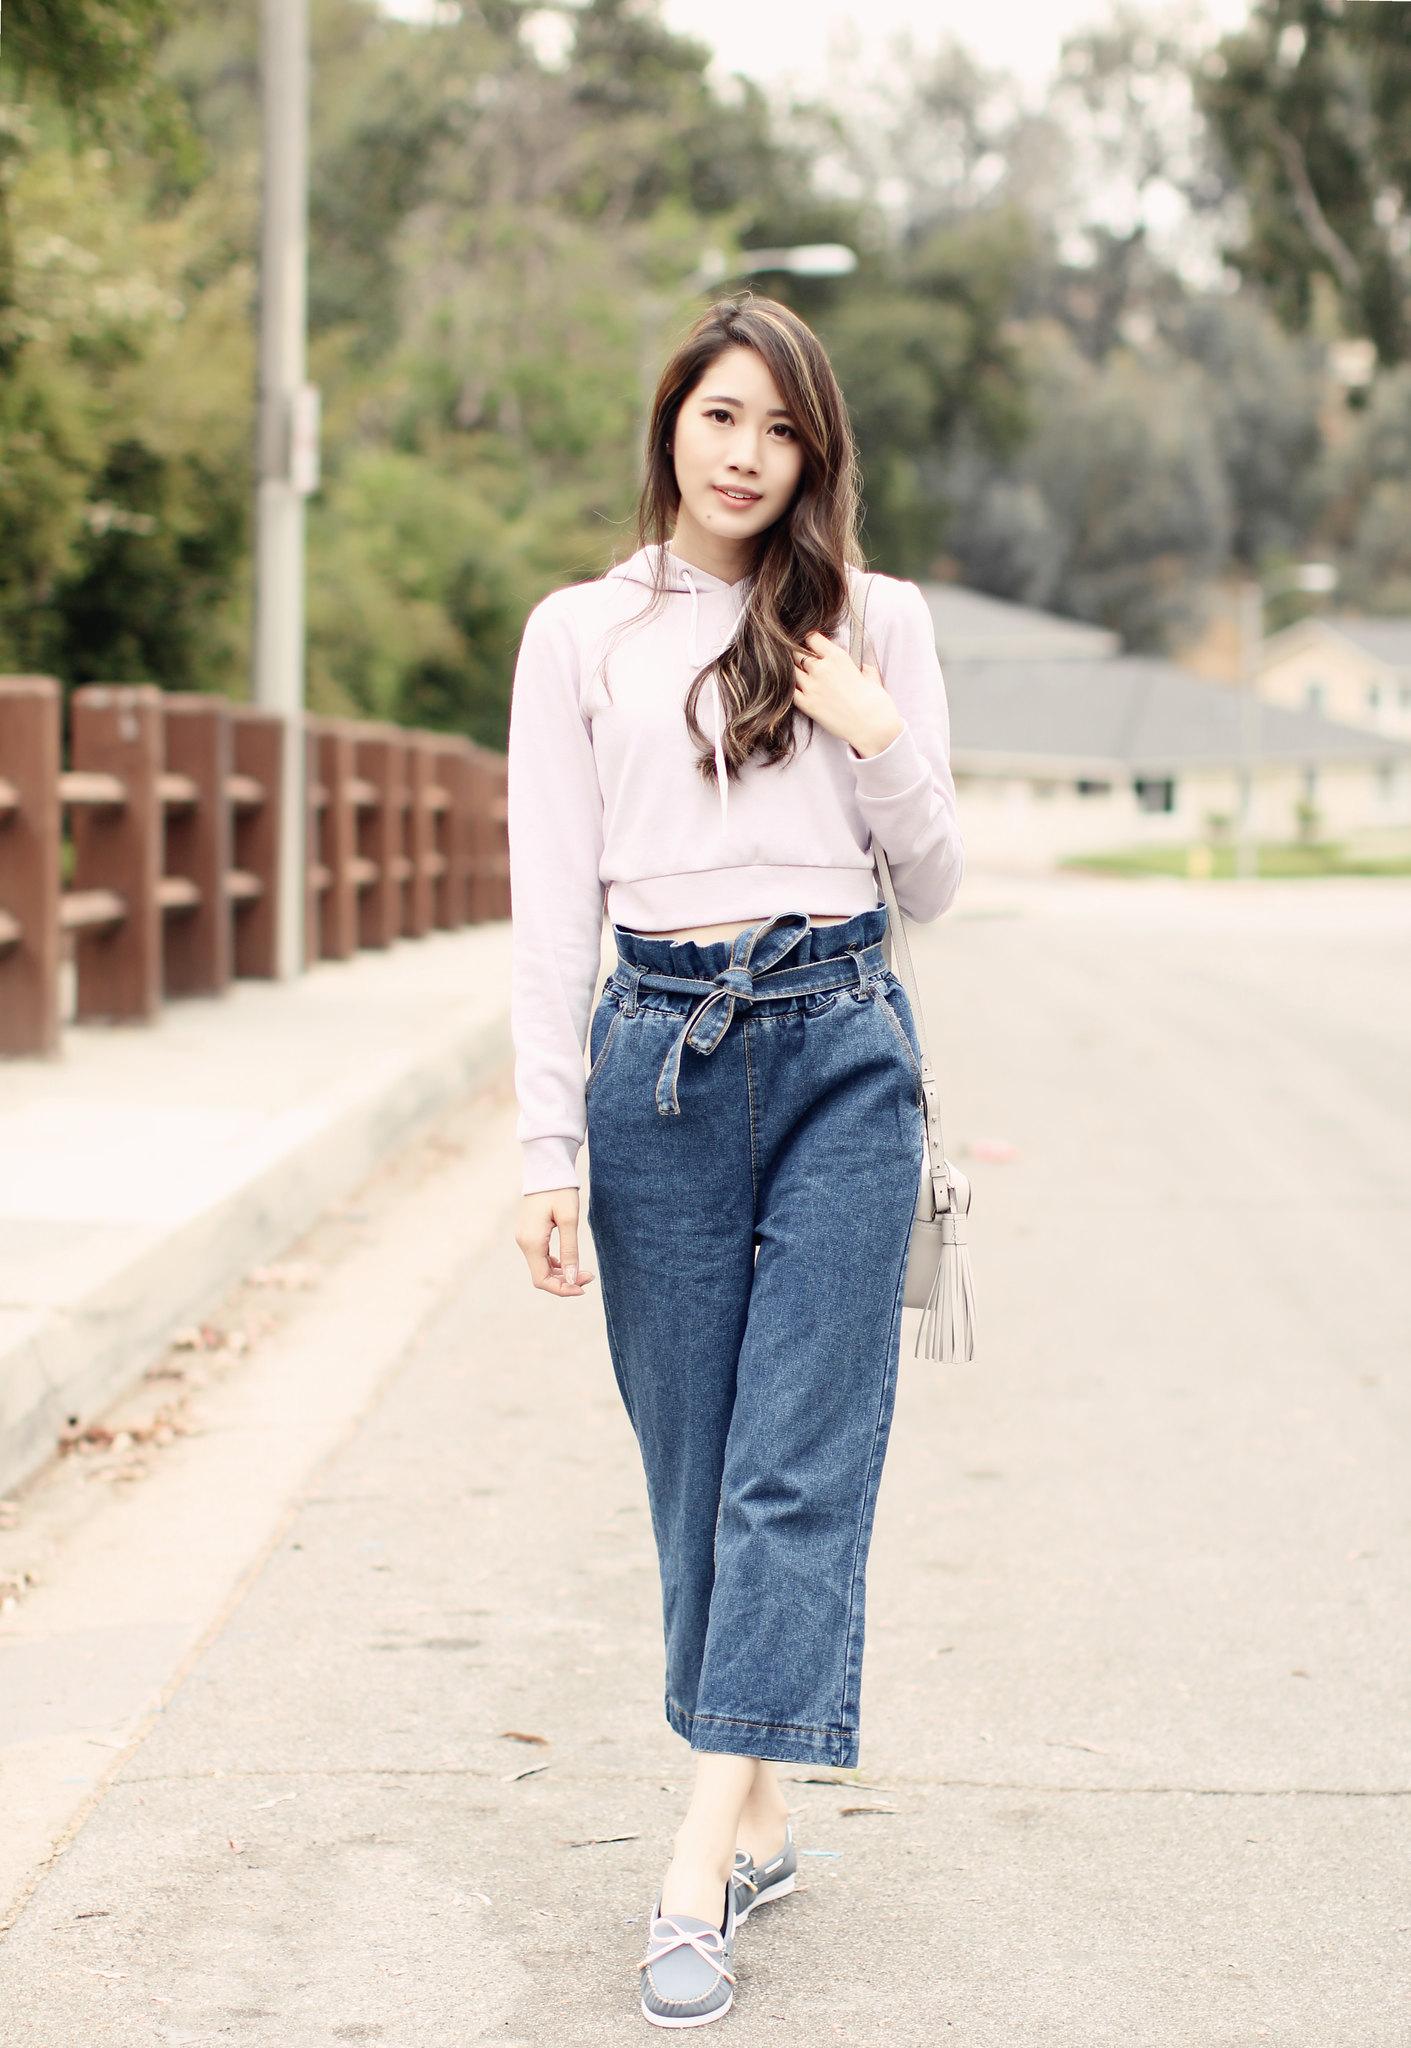 5063-ootd-fashion-style-outfitoftheday-wiwt-streetstyle-zara-f21xme-denim-thrifted-guess-koreanfashion-lookbook-elizabeeetht-clothestoyouuu